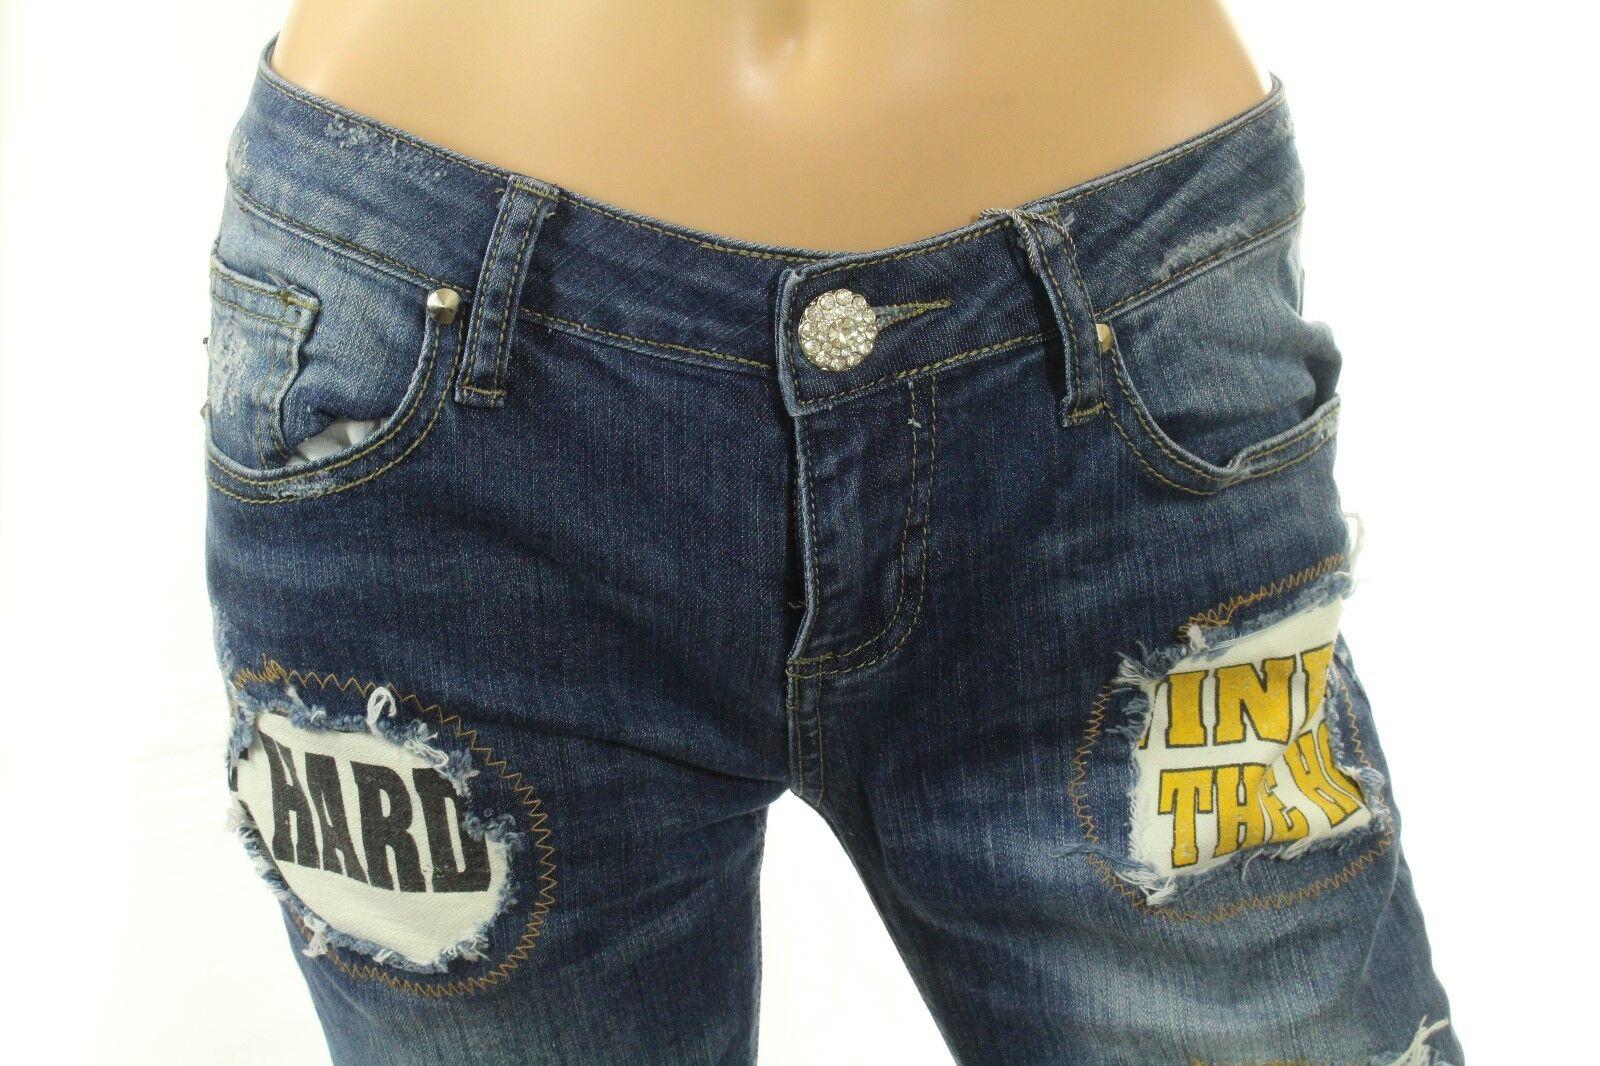 Claudio Milano Skinny Jeans Distressed Patches Swarovski Crystal Size 7